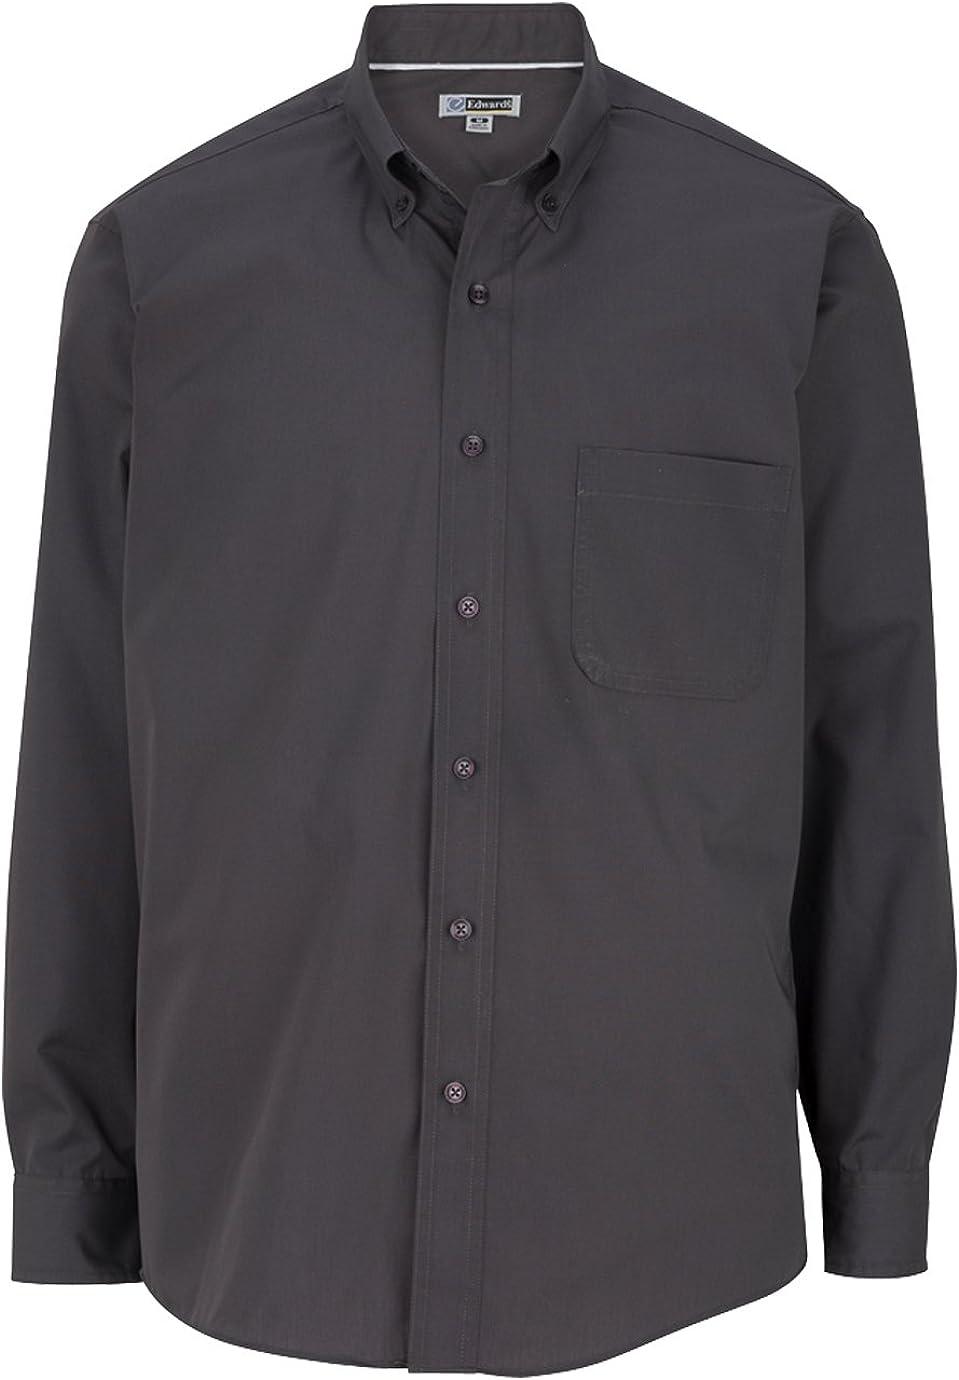 Edwards Garment Men's Big And Tall Easy Care Poplin Shirt_STEELE GREY_6XLT